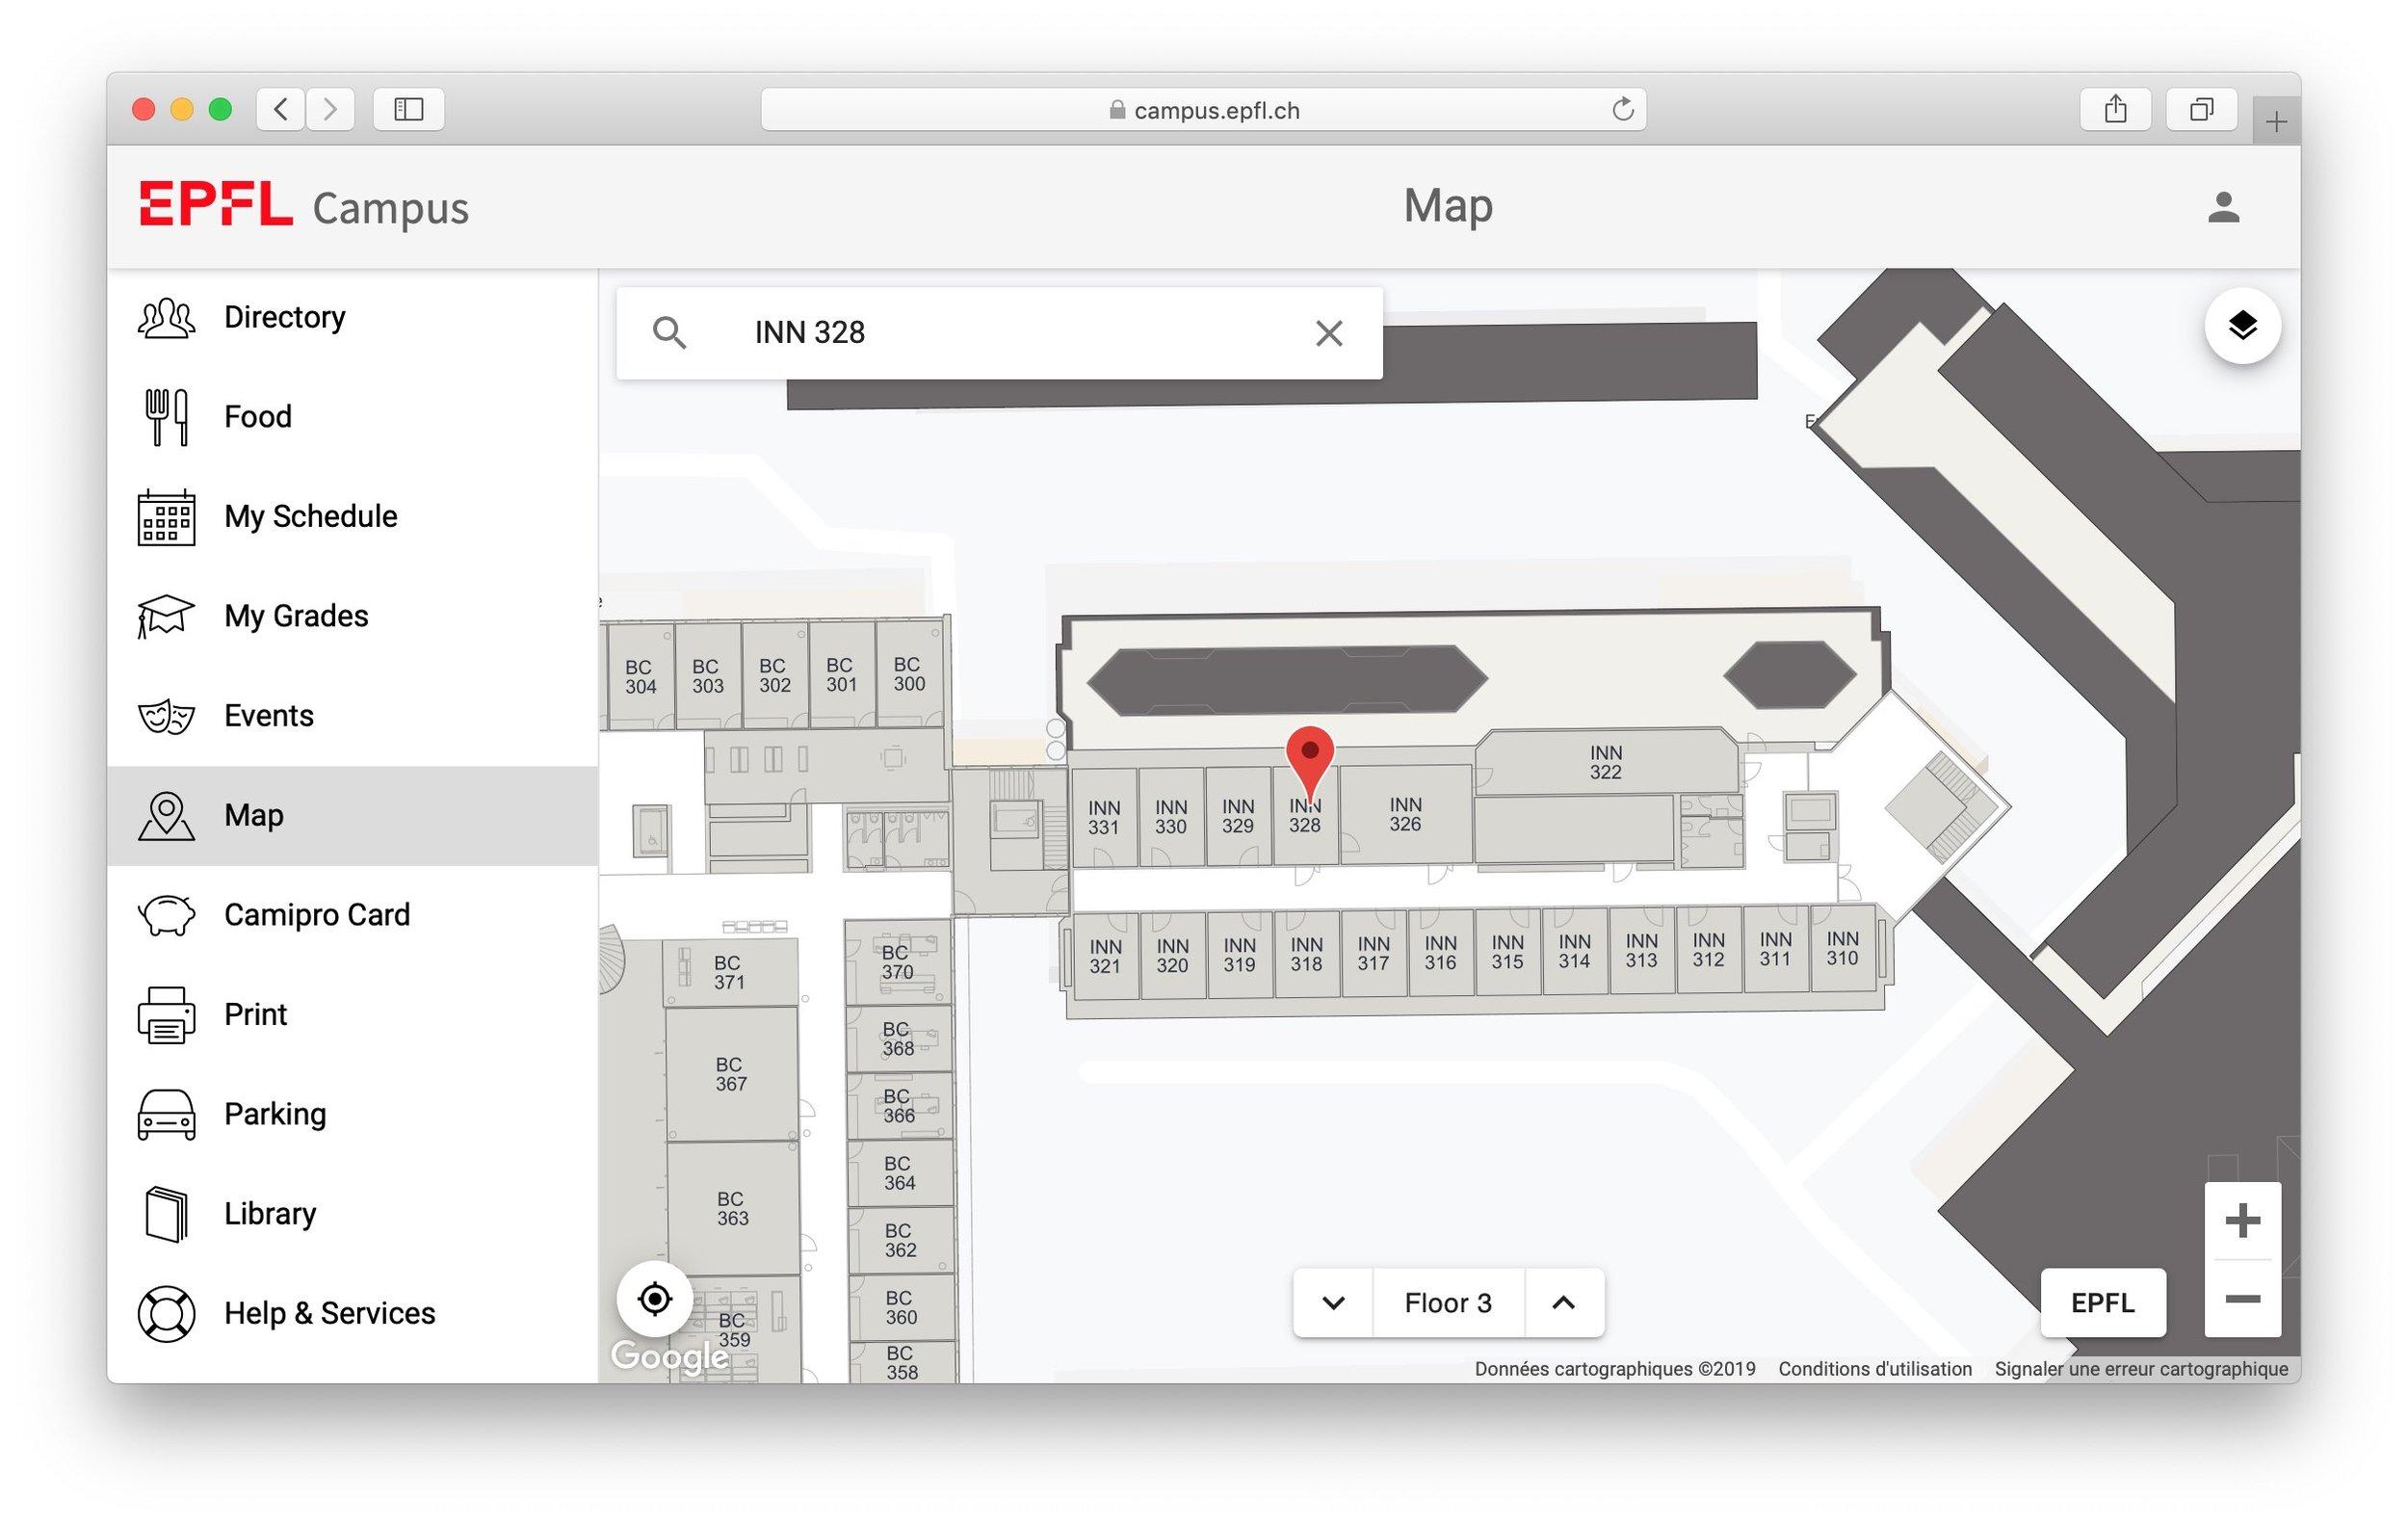 Example: EPFL Campus Web App (https://campus.epfl.ch)